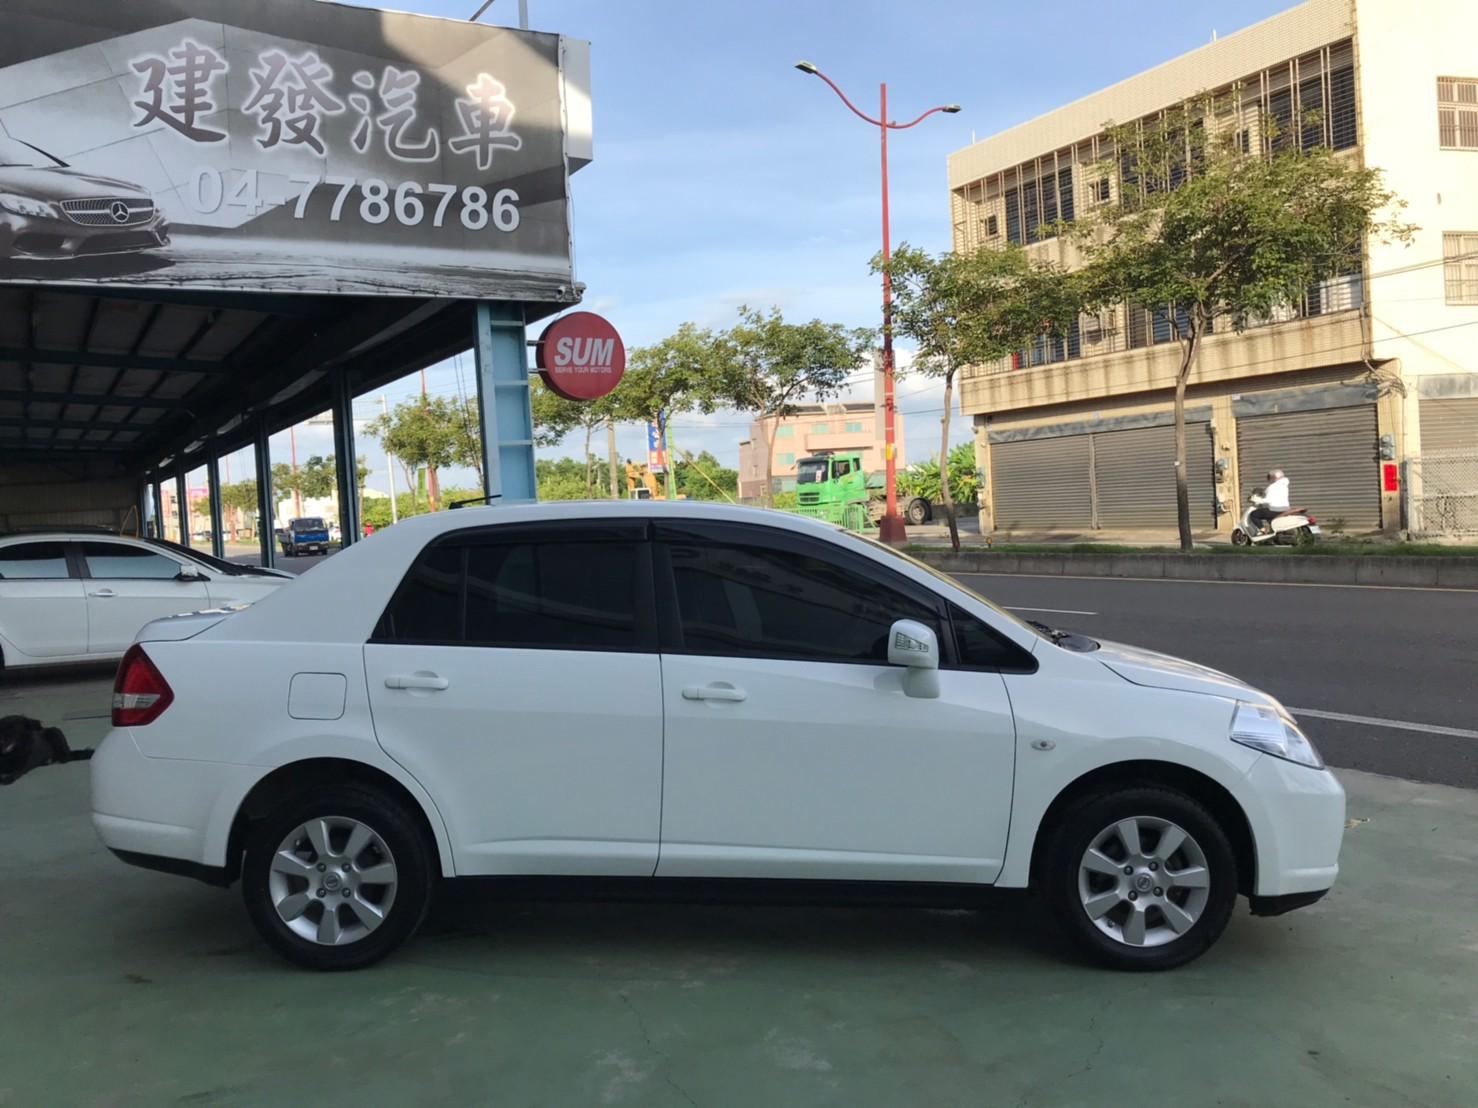 2017TIIDA 4D 里程保證 認證車 白色黑內裝 代步上課通勤好停車 SUM29.8 1.6c_210615_3